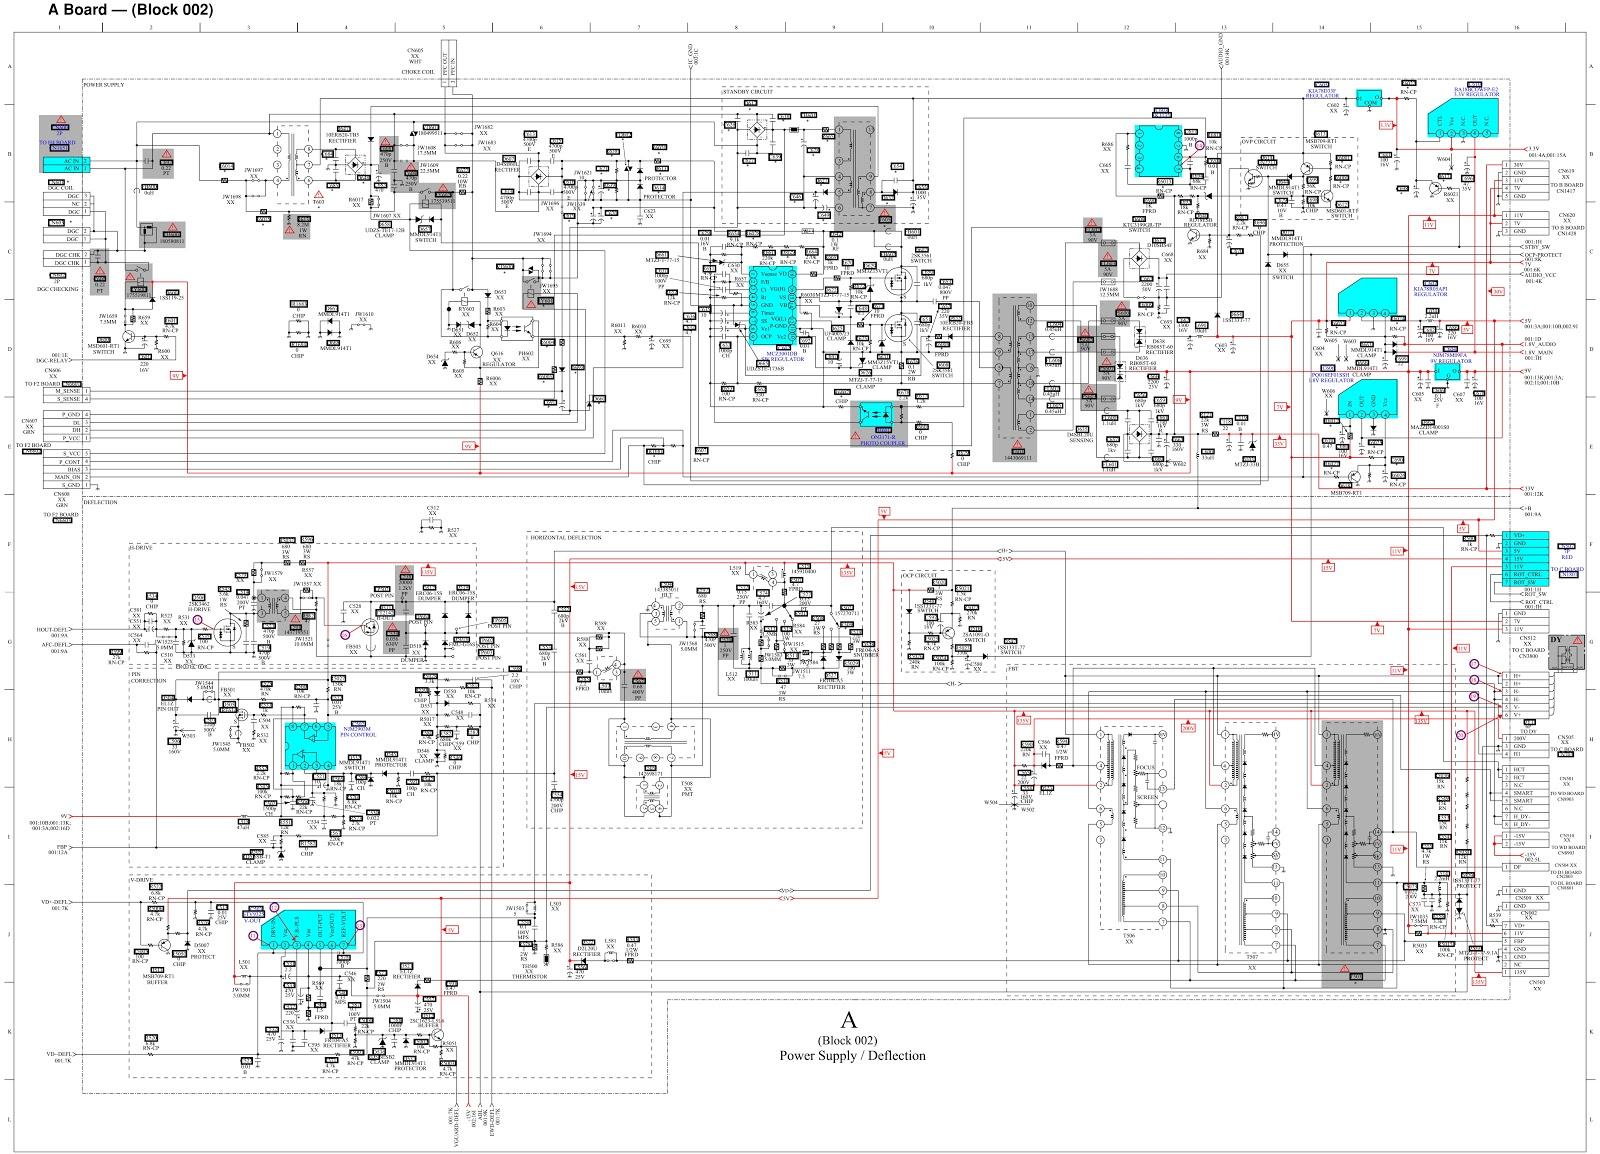 sony tv circuit diagram wiring diagram new lcd tv circuit diagram circuit diagrams free caroldoey [ 1600 x 1154 Pixel ]